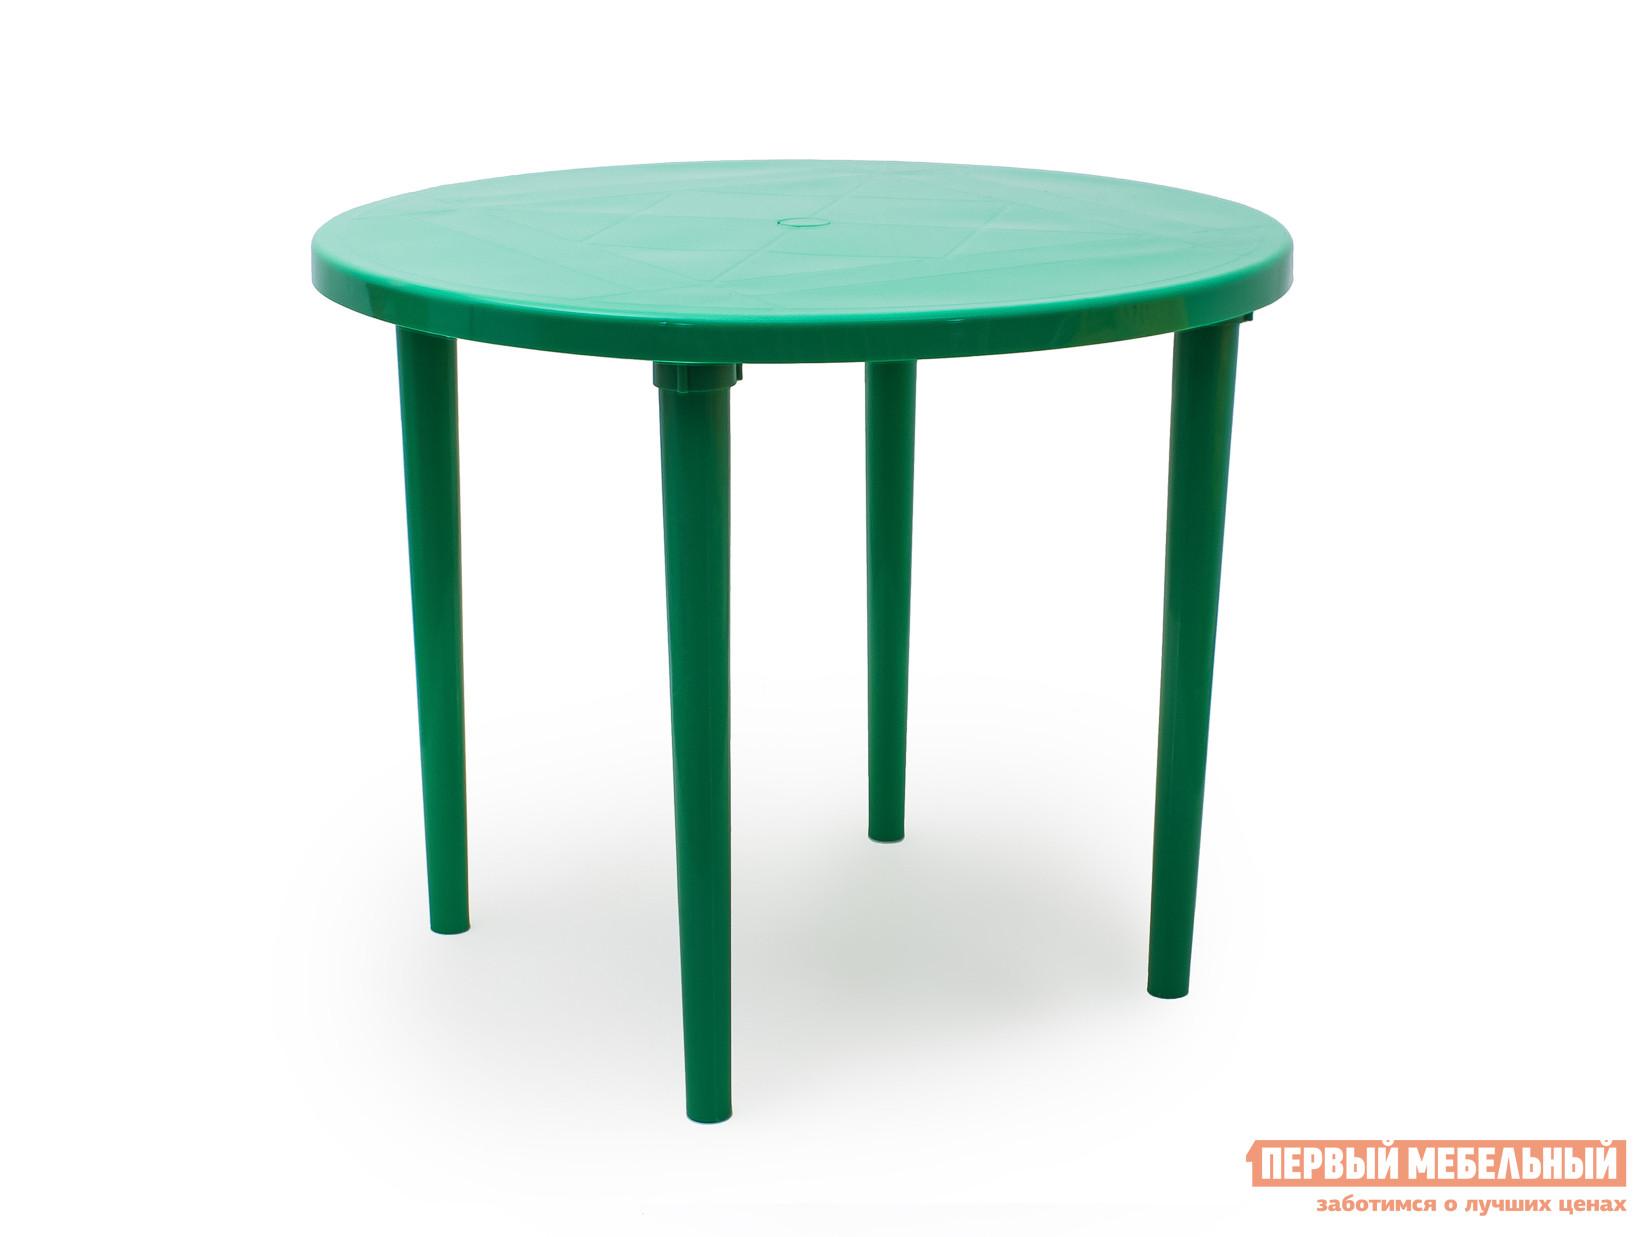 Пластиковый стол Стандарт Пластик Стол круглый, д. 900 мм Зеленый